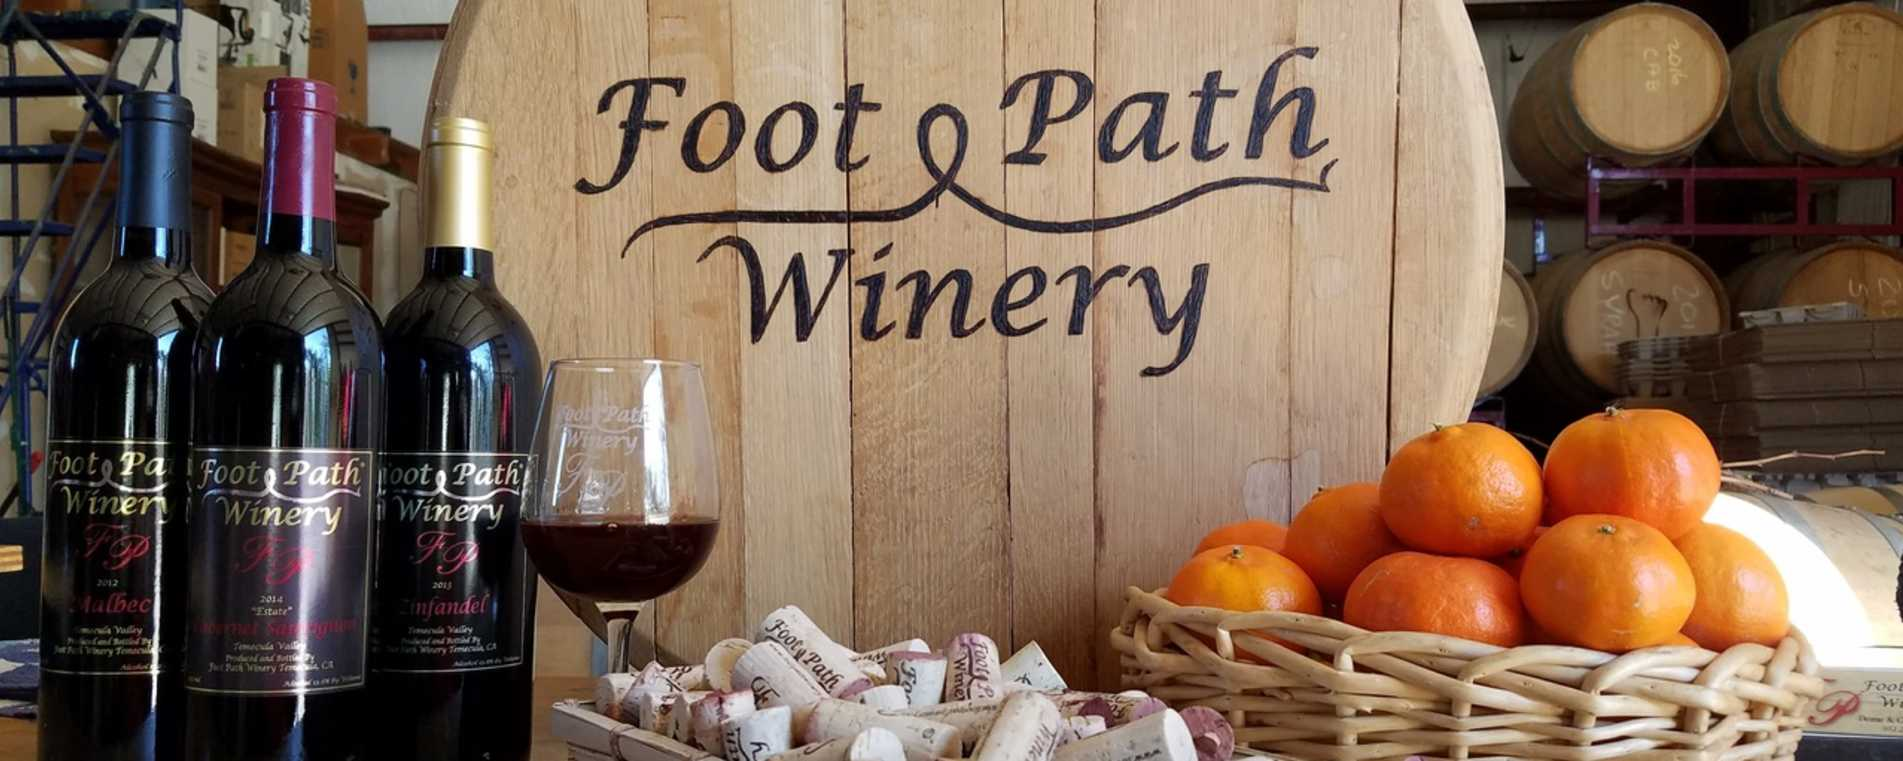 Foot Path Winery - Temecula